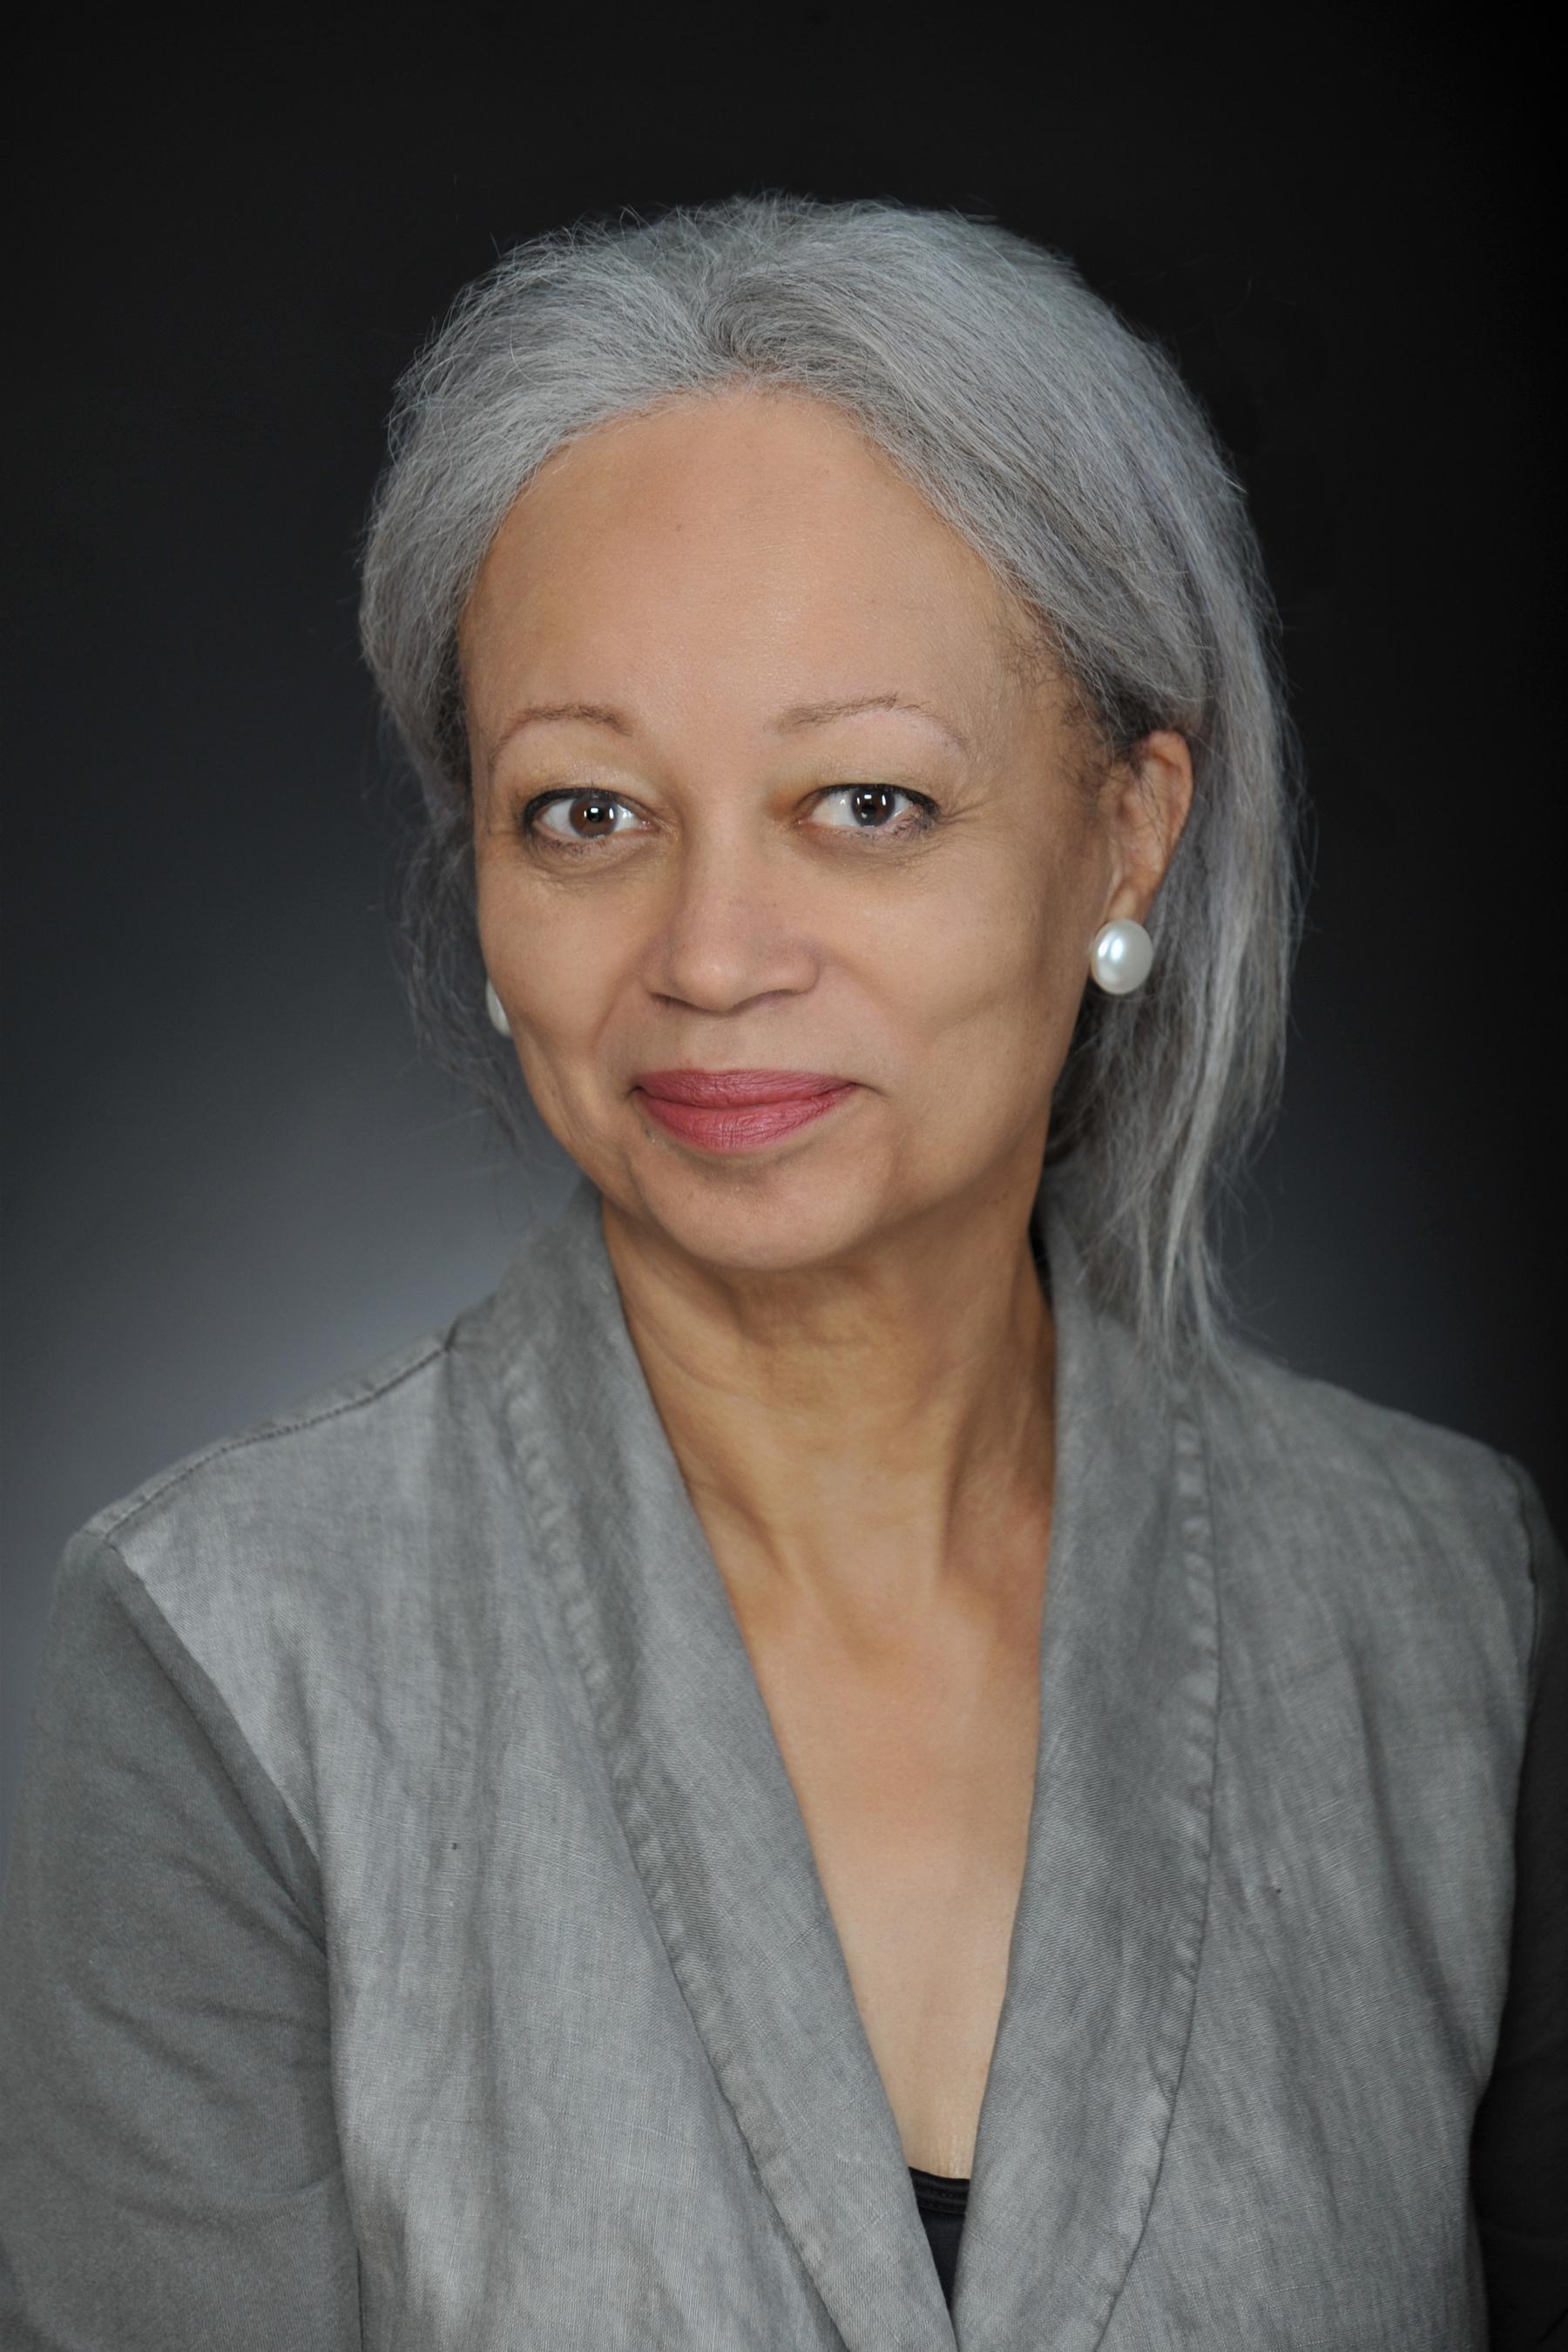 Patricia Williams Net Worth